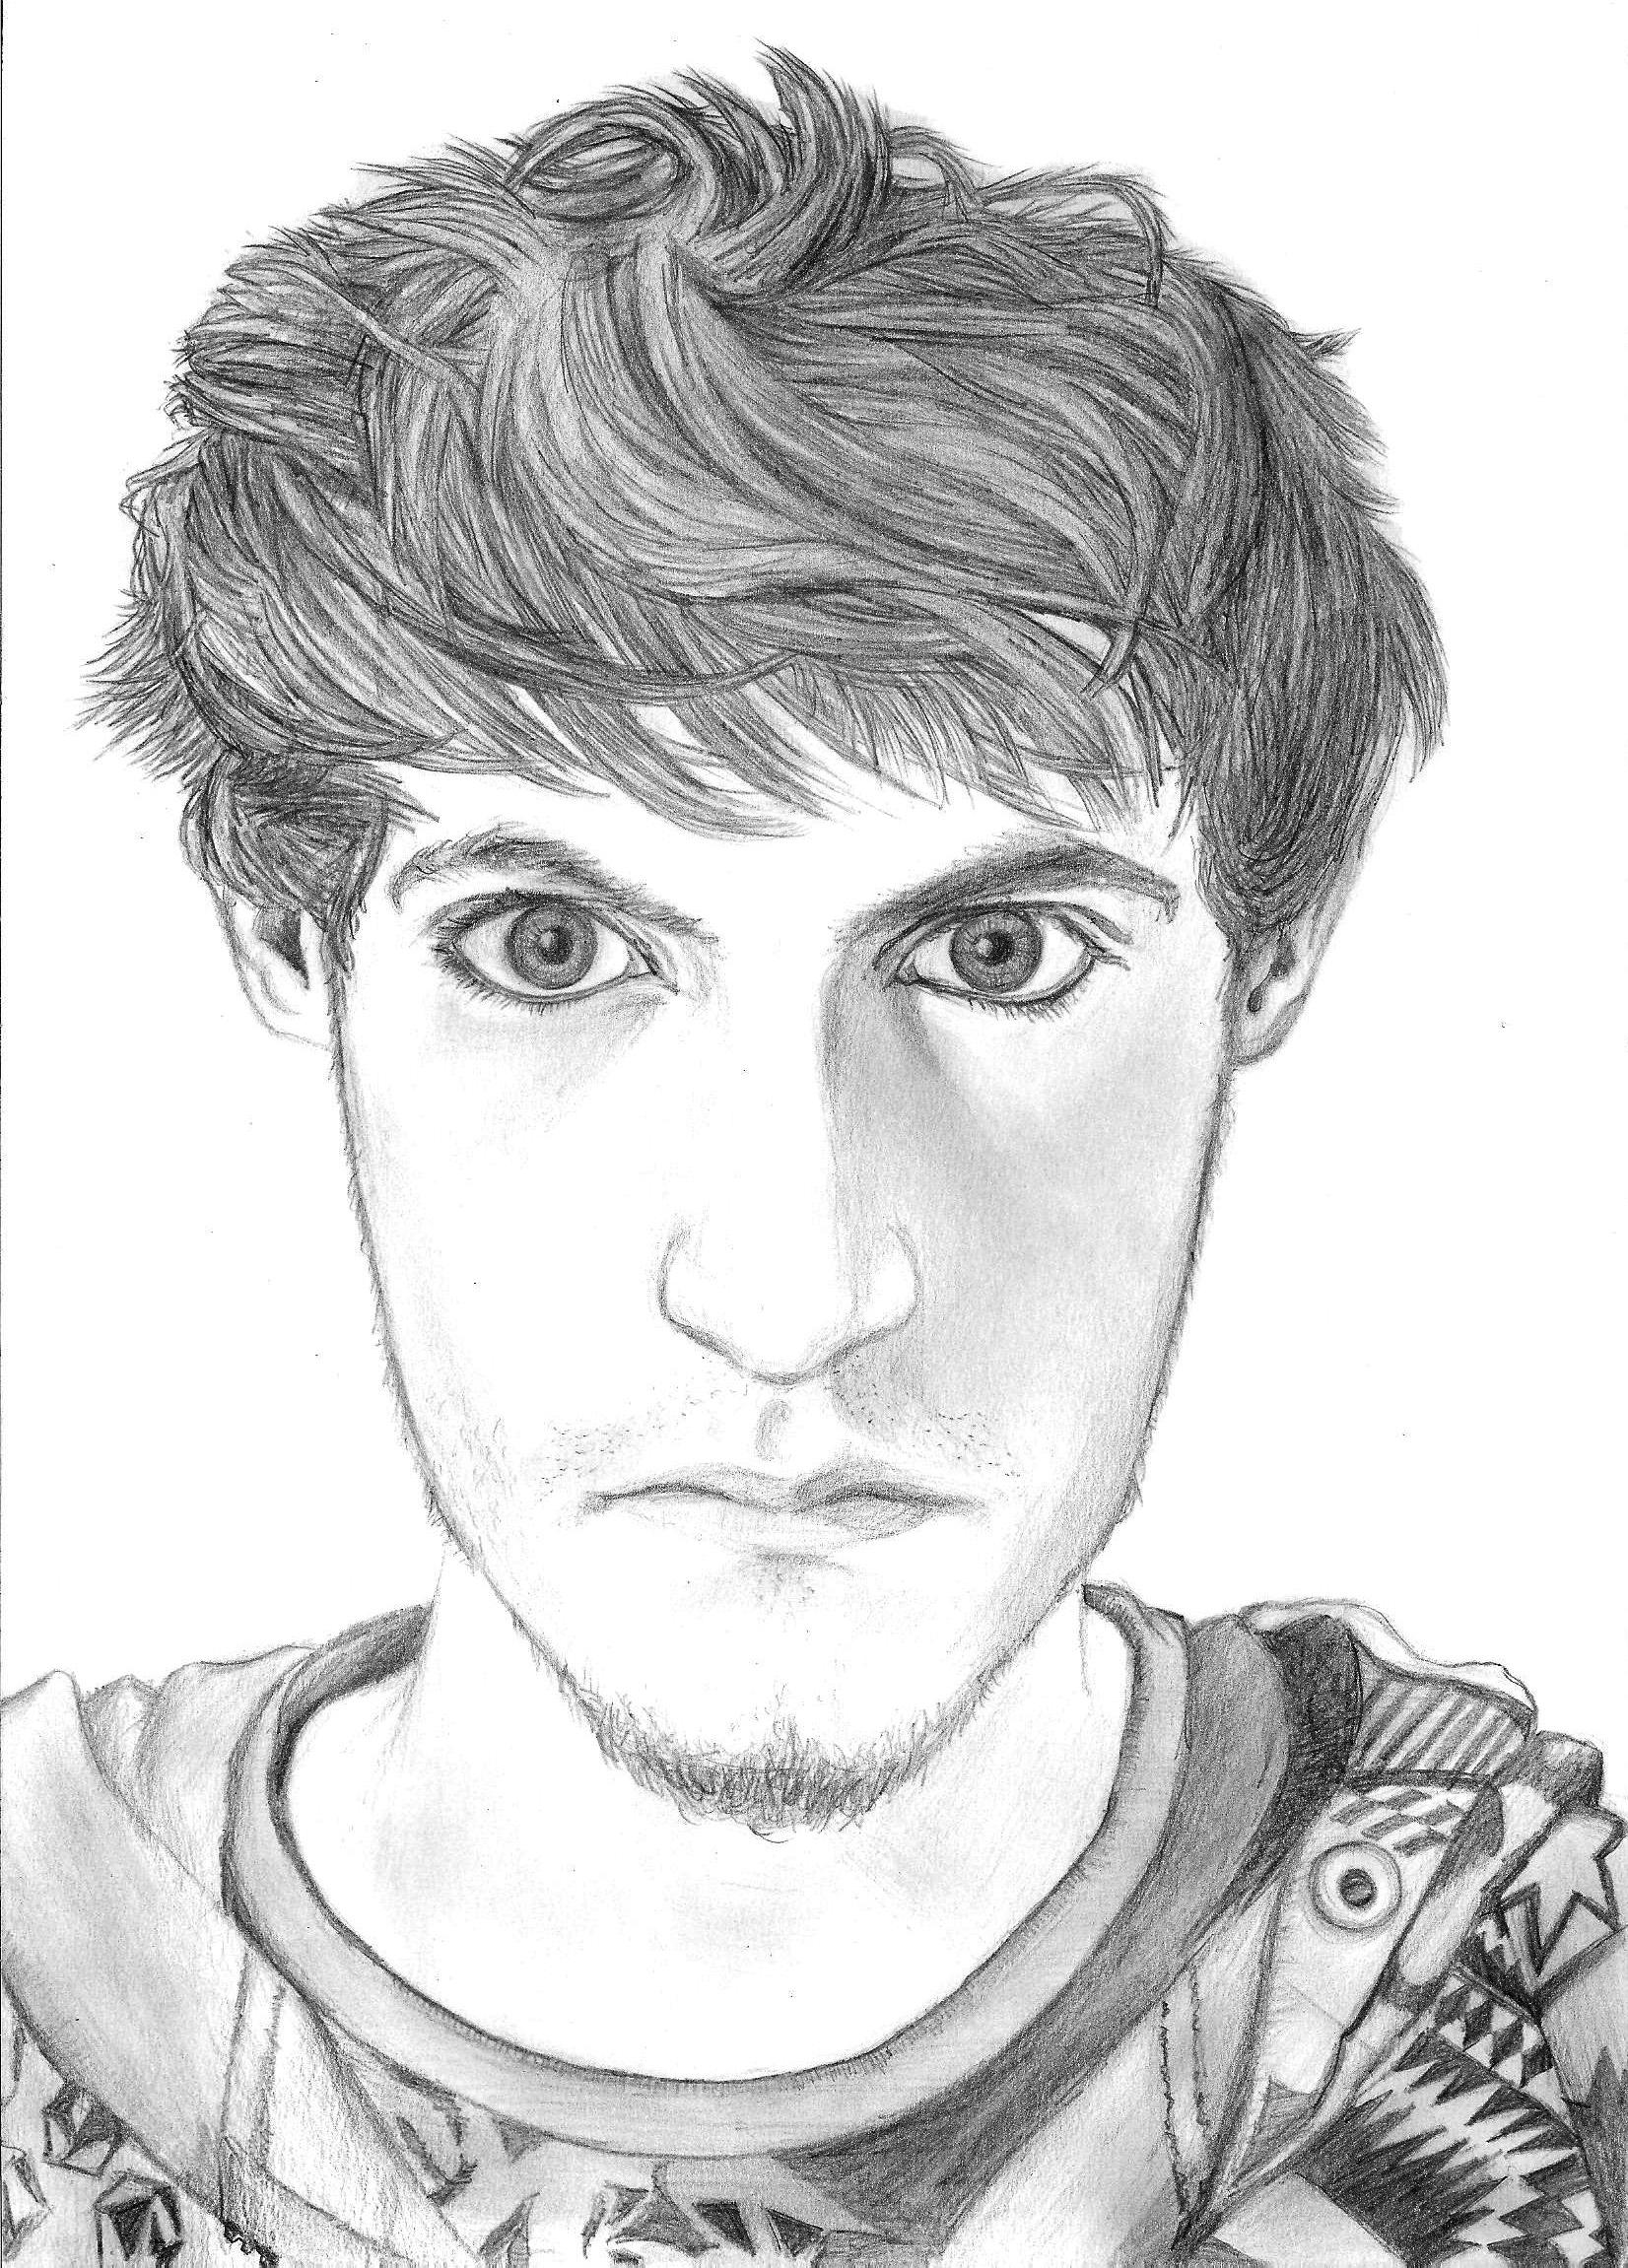 Drawing 'Self portrait'